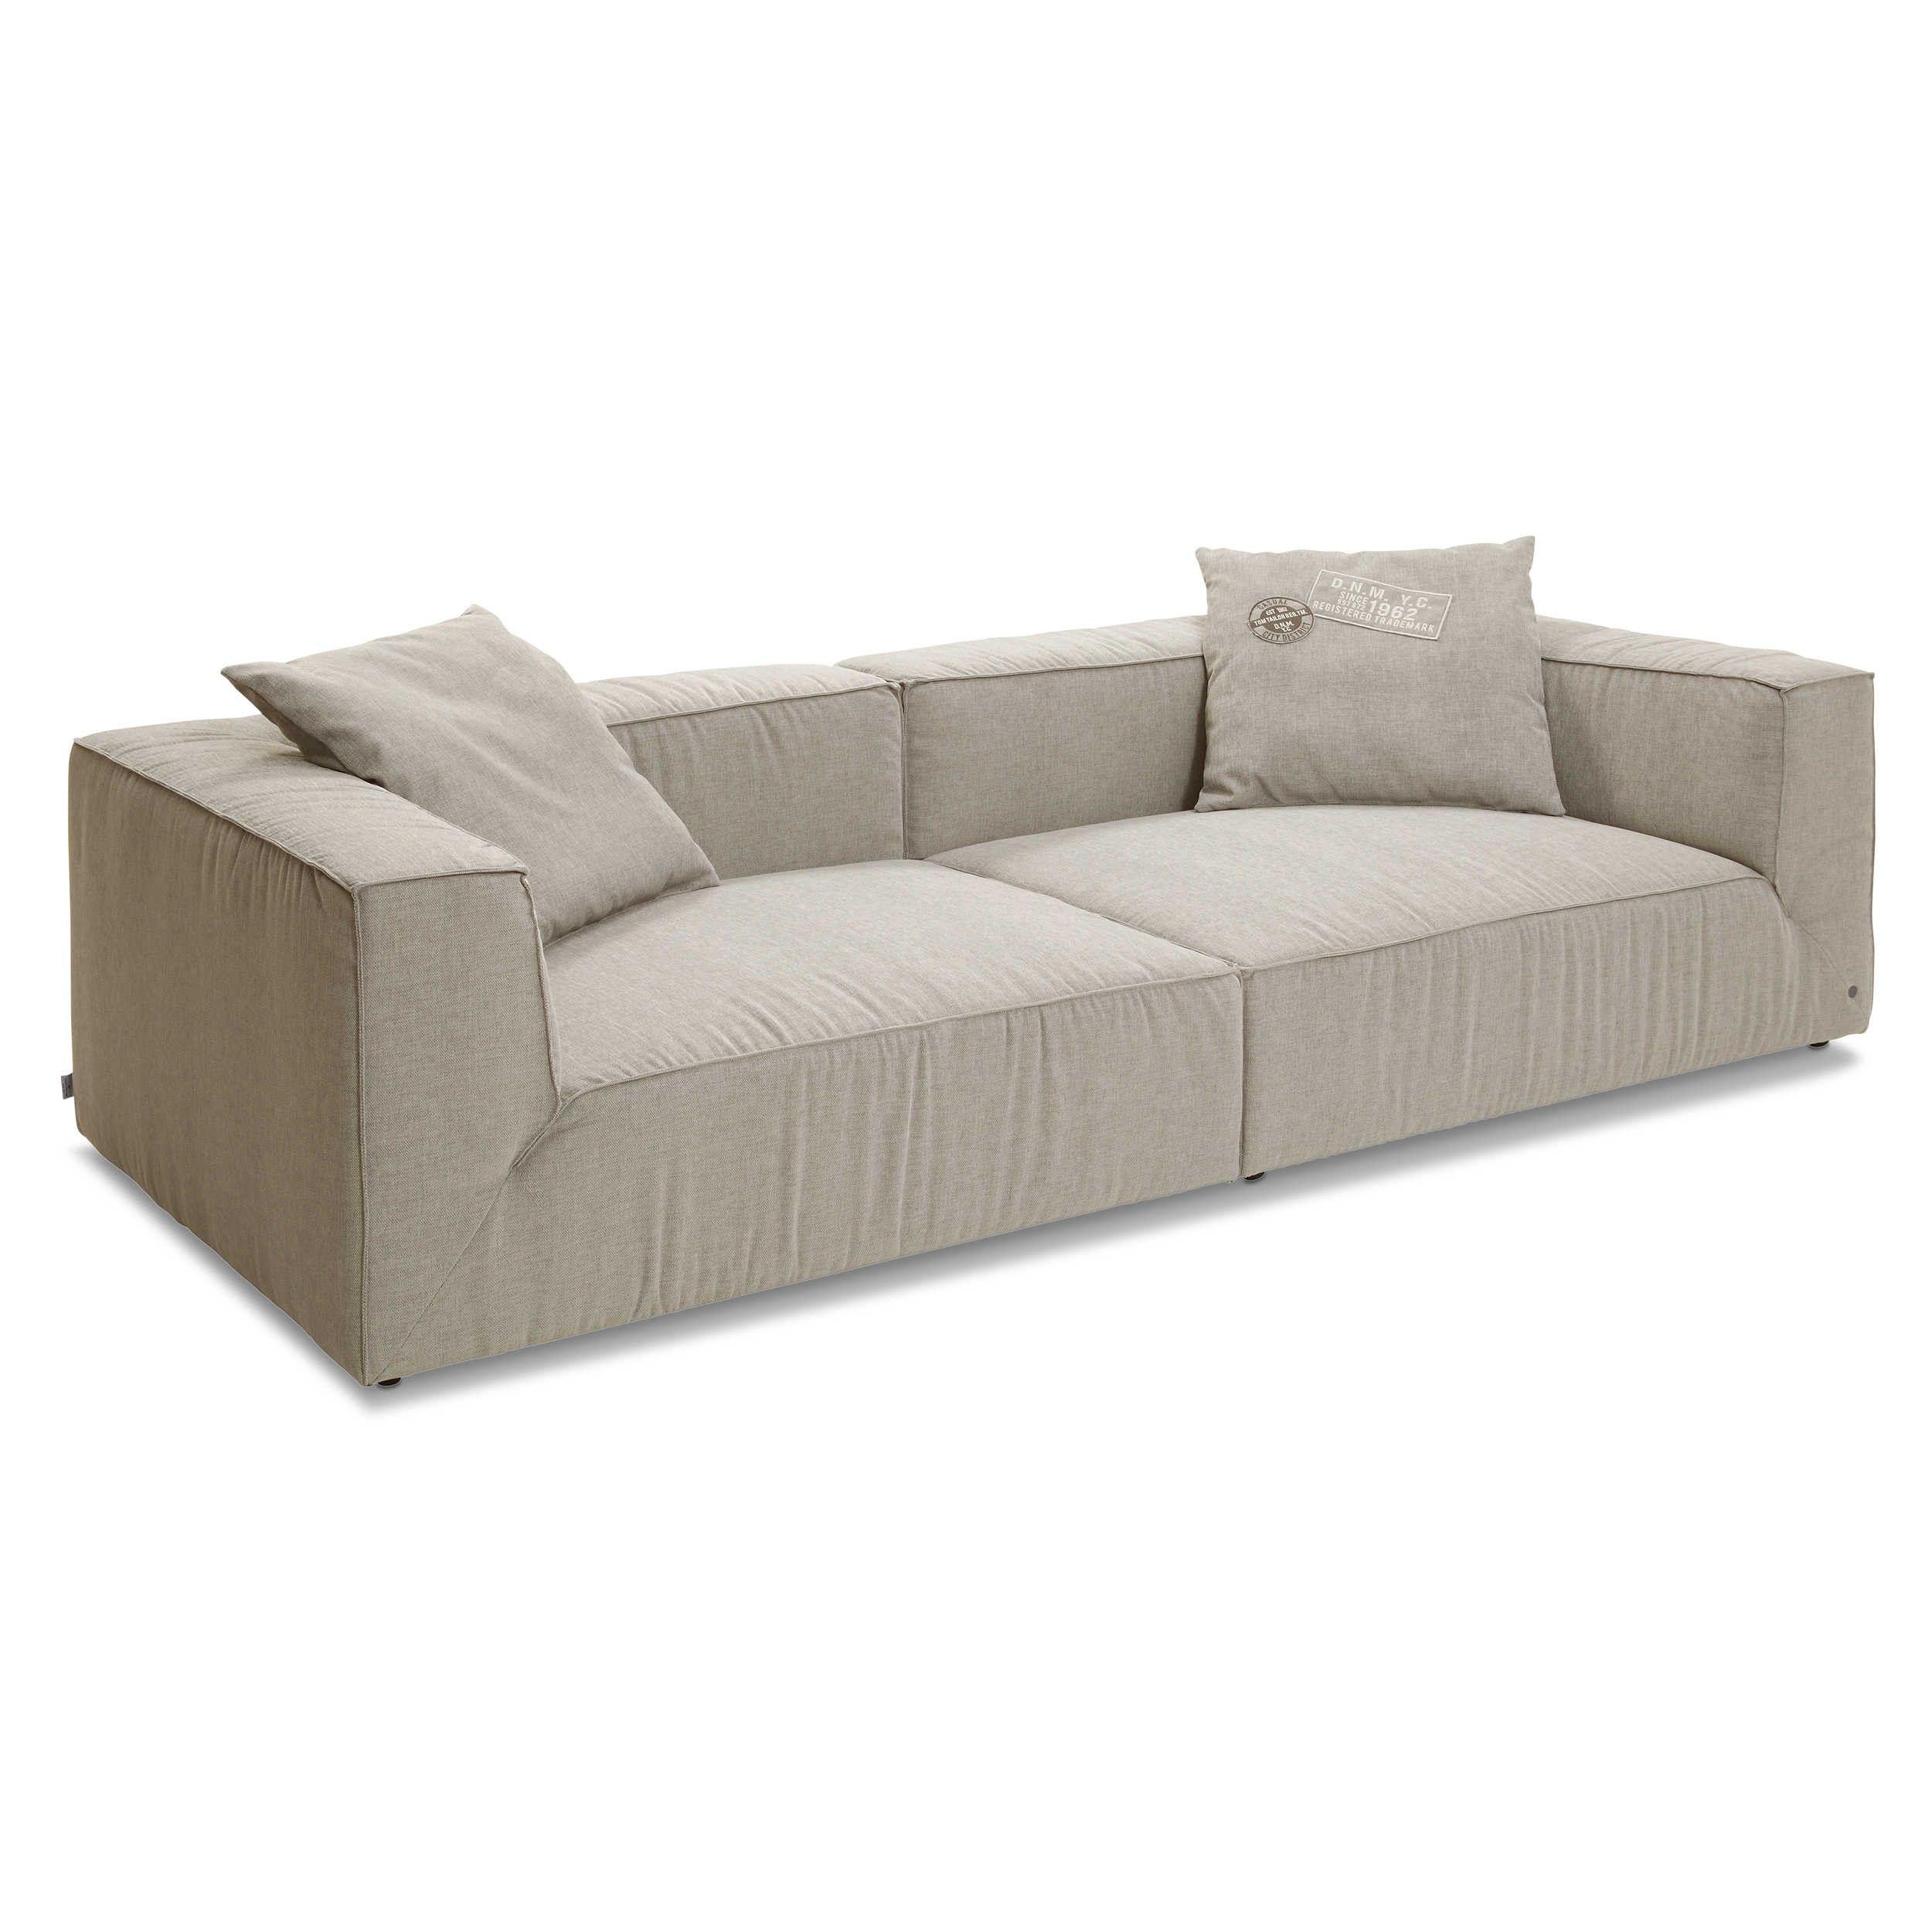 Tom Tailor Megasofa Big Cube Creme Stoff Online Kaufen Bei Sofa Outdoor Sofa Sofa Couch